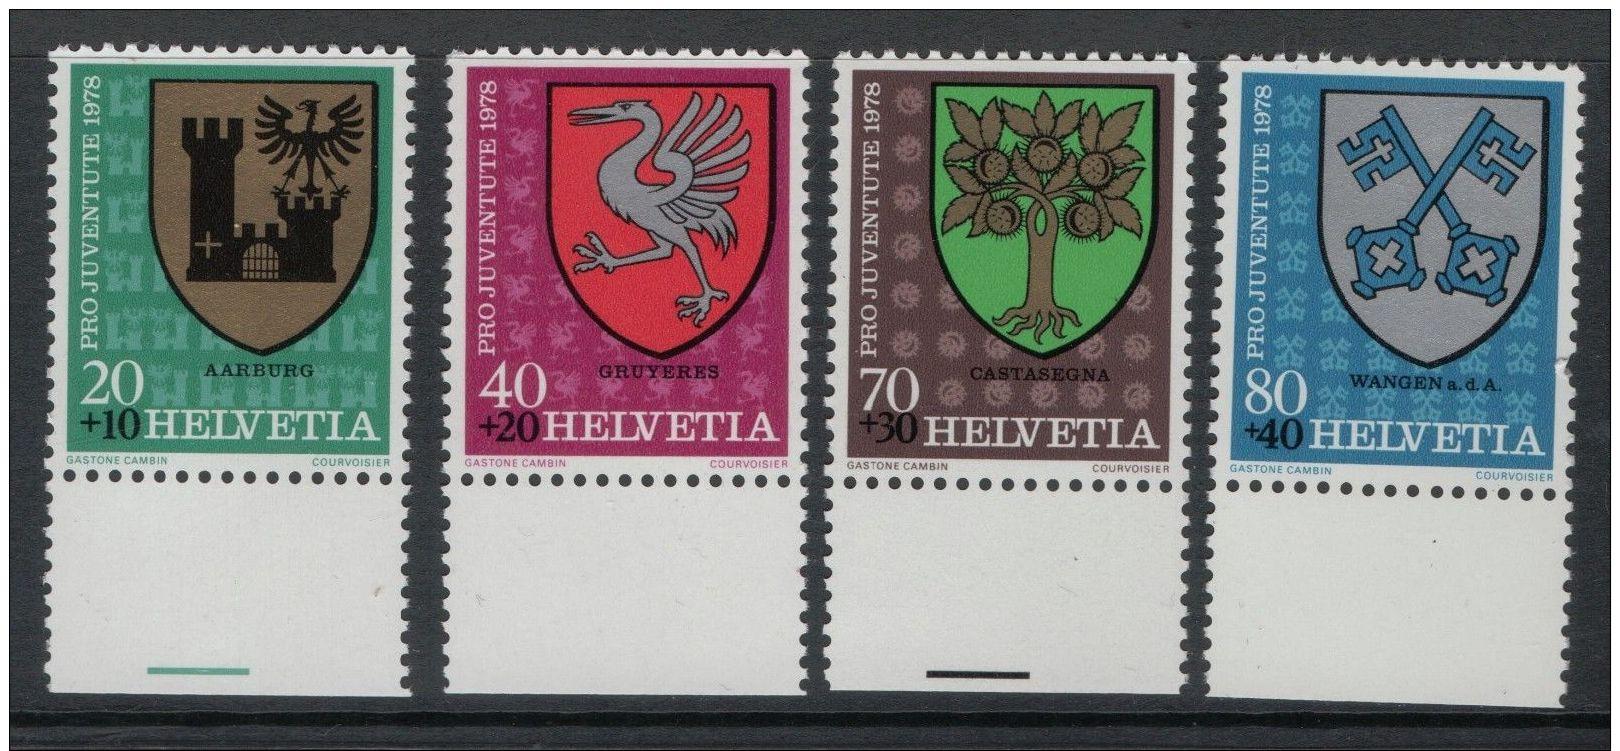 Switzerland 1977 Wild Roses Set ScB451 - 4 4 Stamps MNH - Suisse